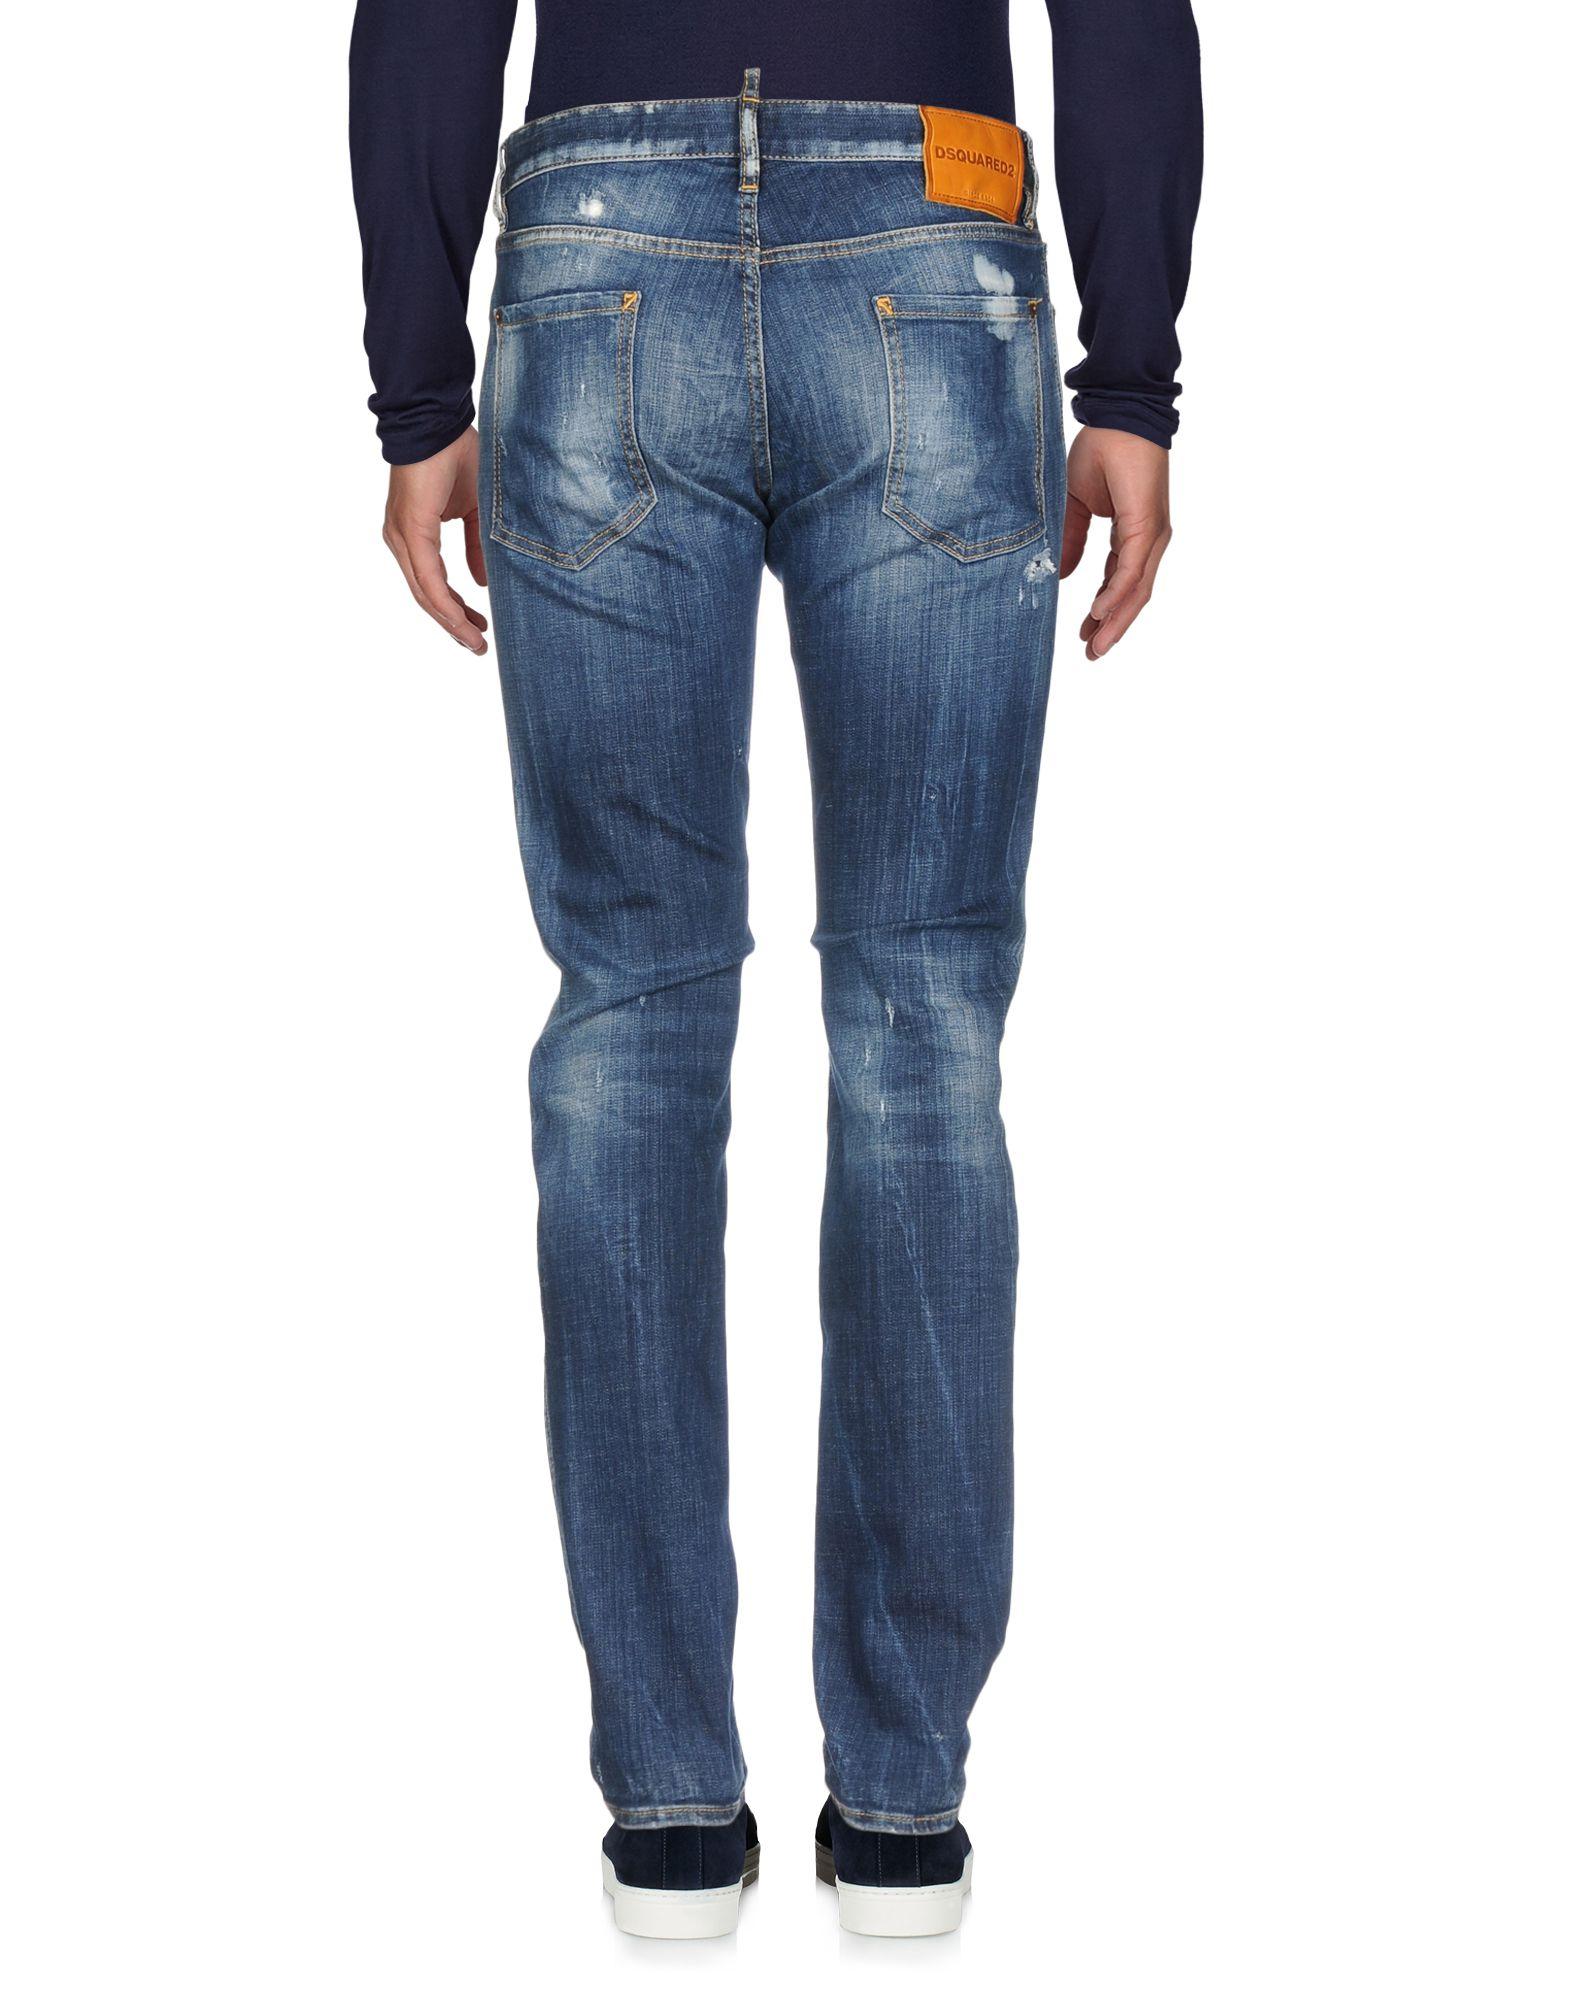 Pantaloni Jeans Dsquarosso2 Uomo Uomo Dsquarosso2 - 42673204XW 17a2fb